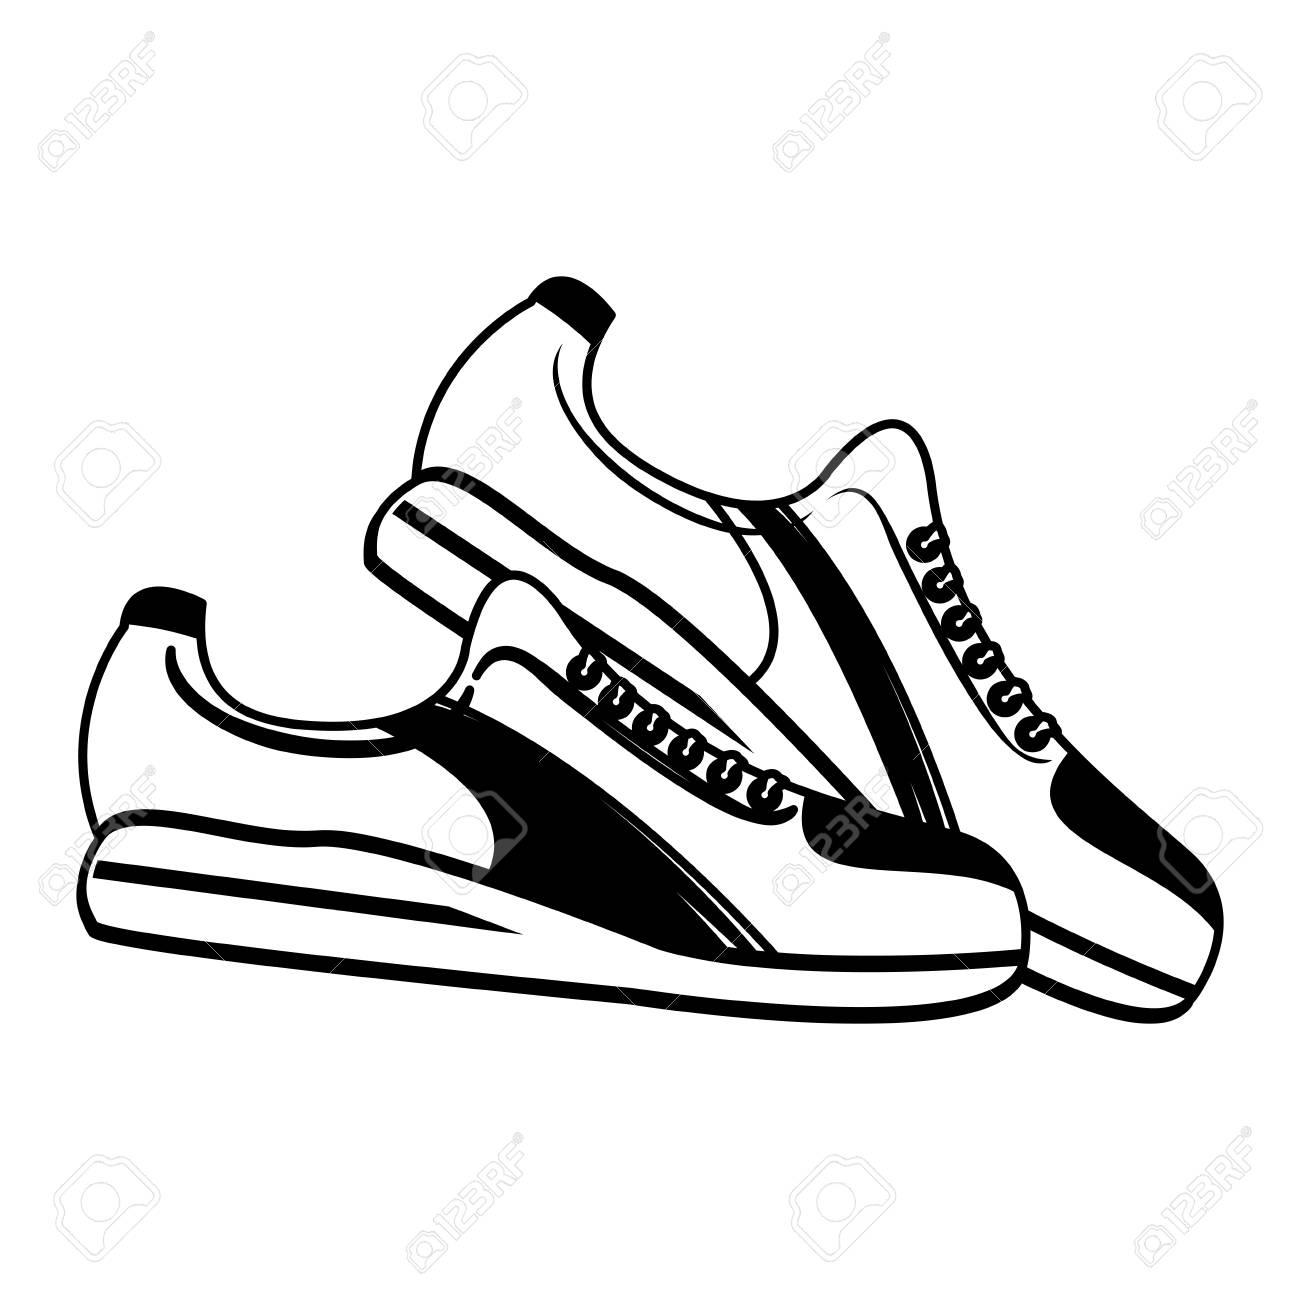 single sneaker sport shoe icon image vector illustration design rh 123rf com sneaker vectoriel sneaker vector art